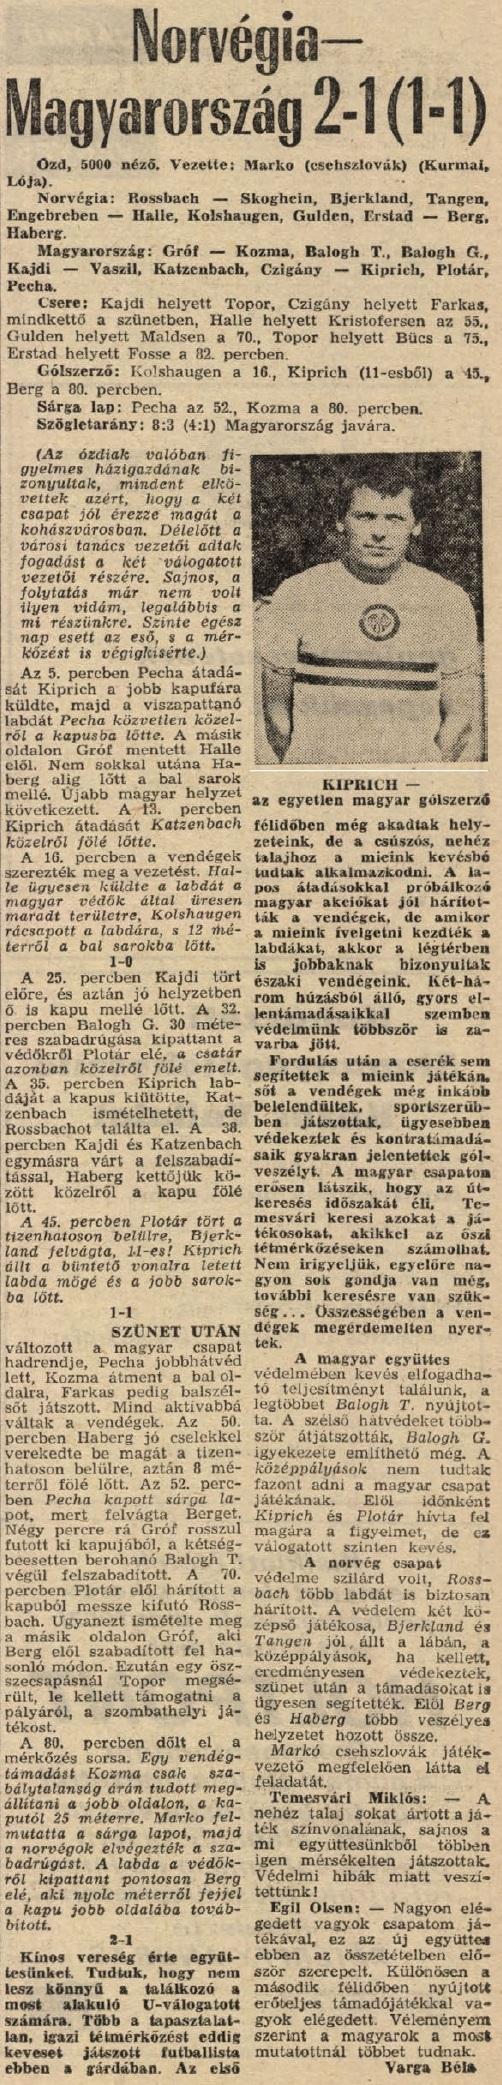 idokapszula_nb_i_1983_84_magyarorszag_norvegia_utanpotlas_valogatott_merkozes.jpg